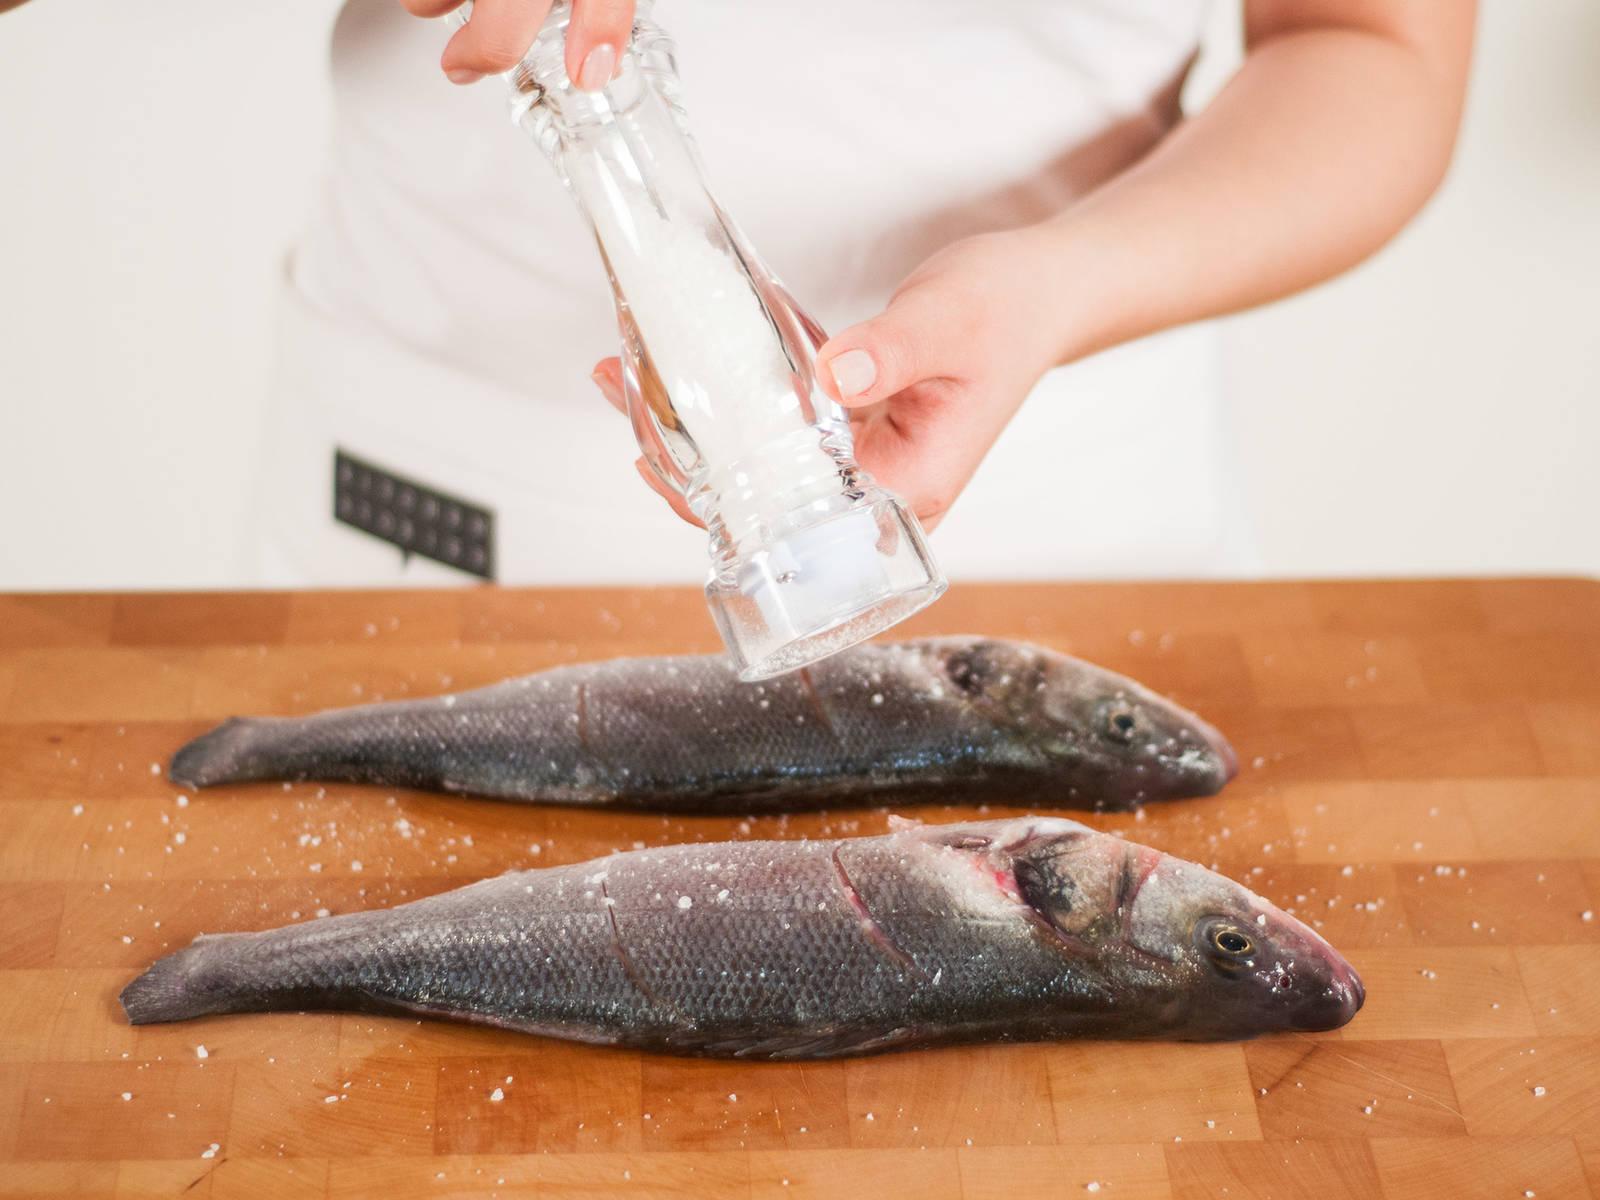 Season fish with salt on each side.